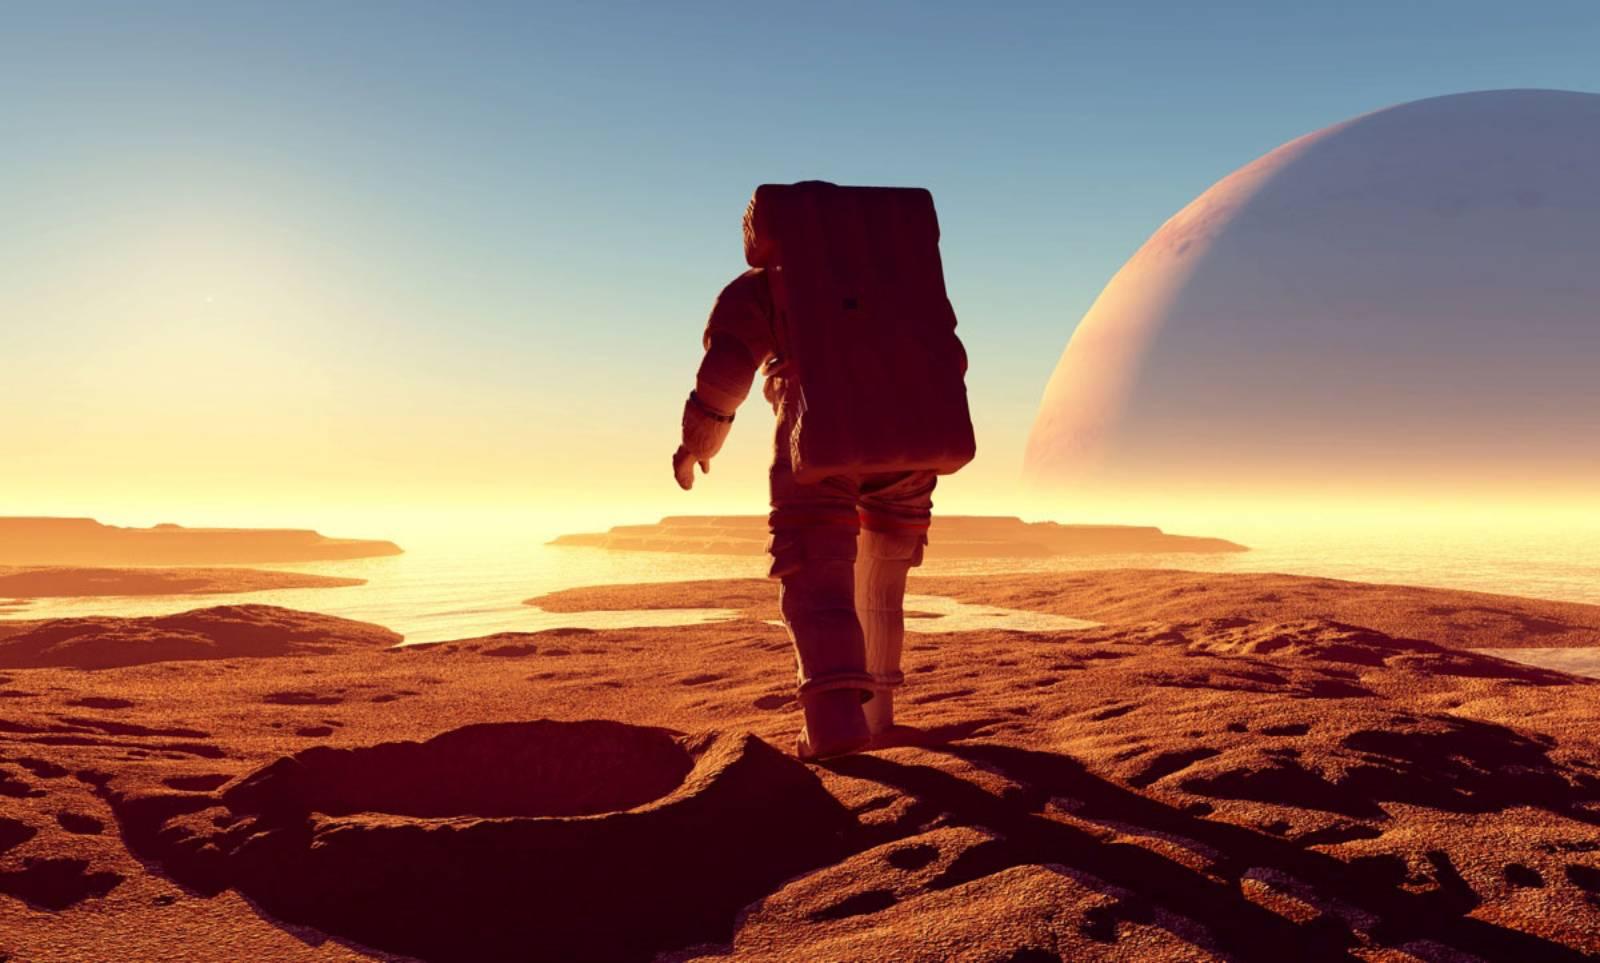 Planeta Marte. Anuntul HALUCINANT despre Formele de VIATA